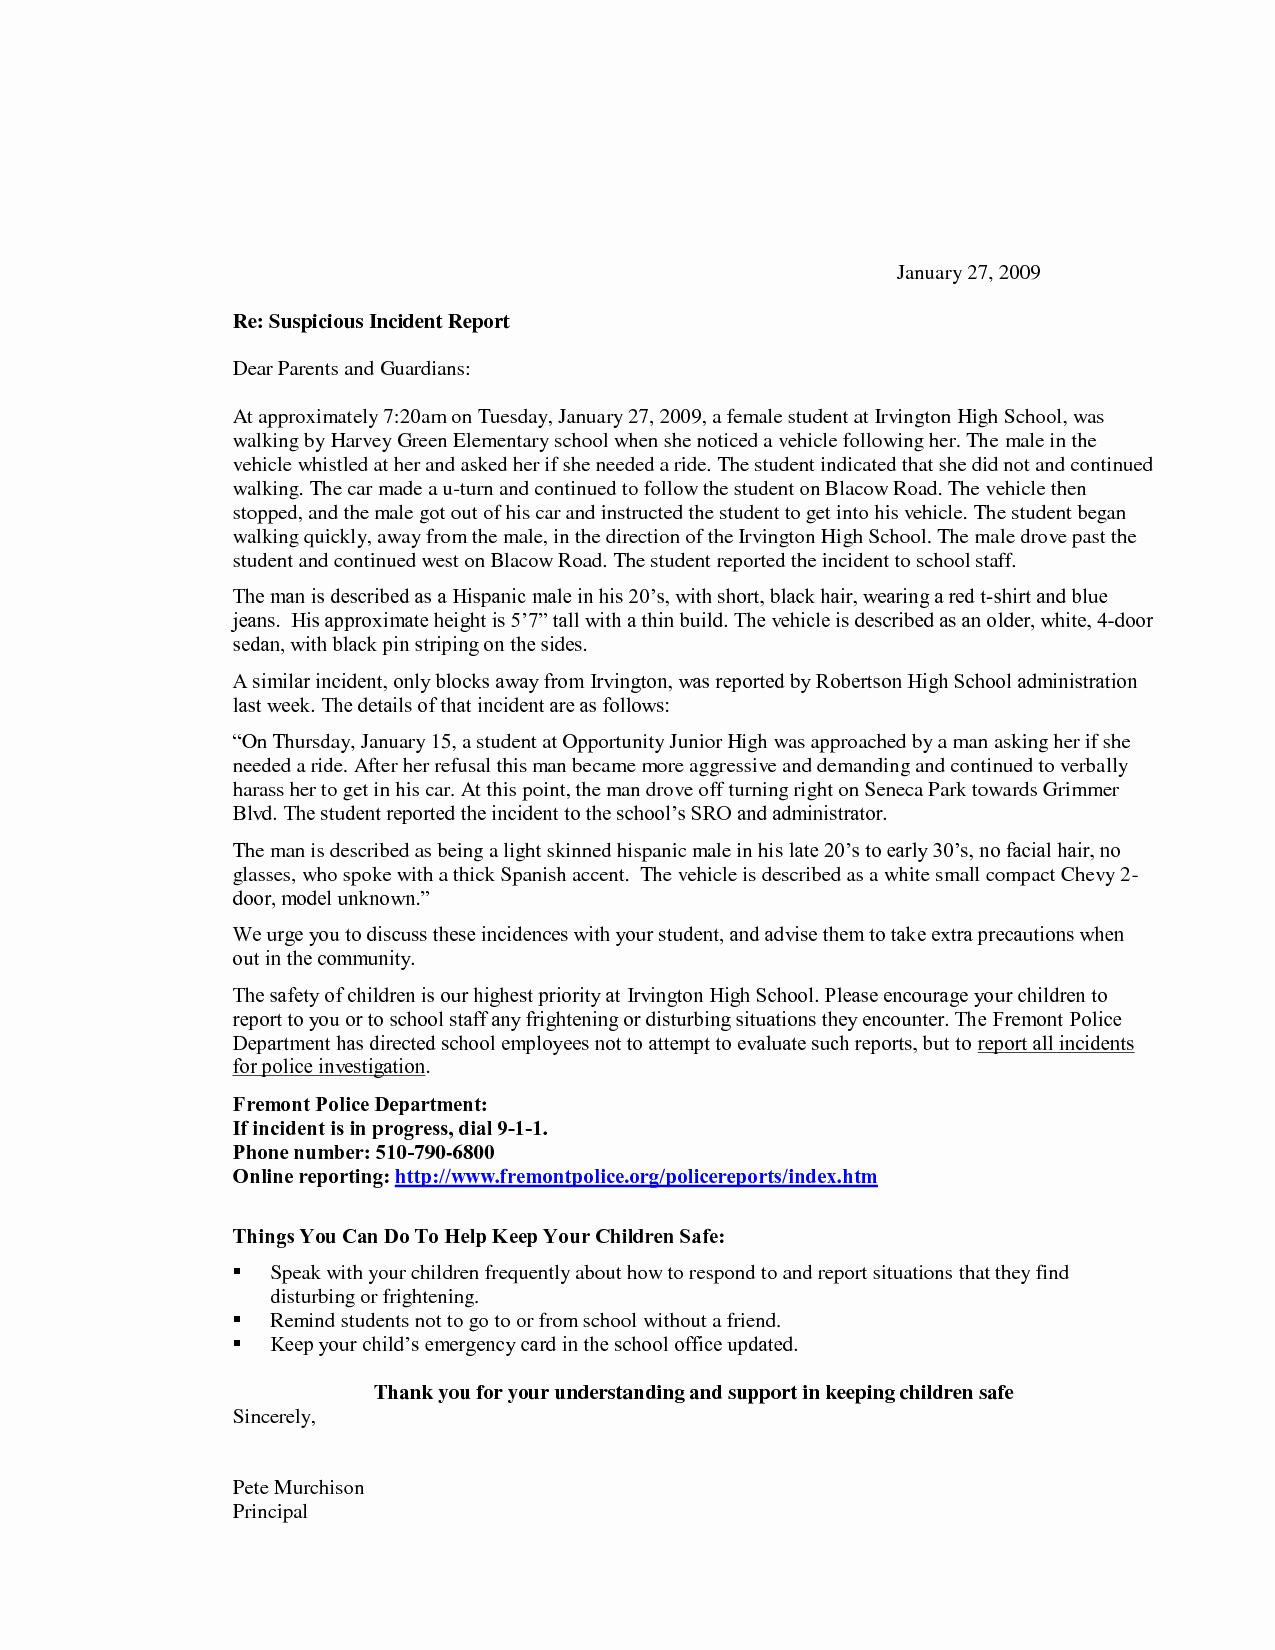 Incident Statement Letter Sample Elegant Report Cover Letter Sample General Performance Account